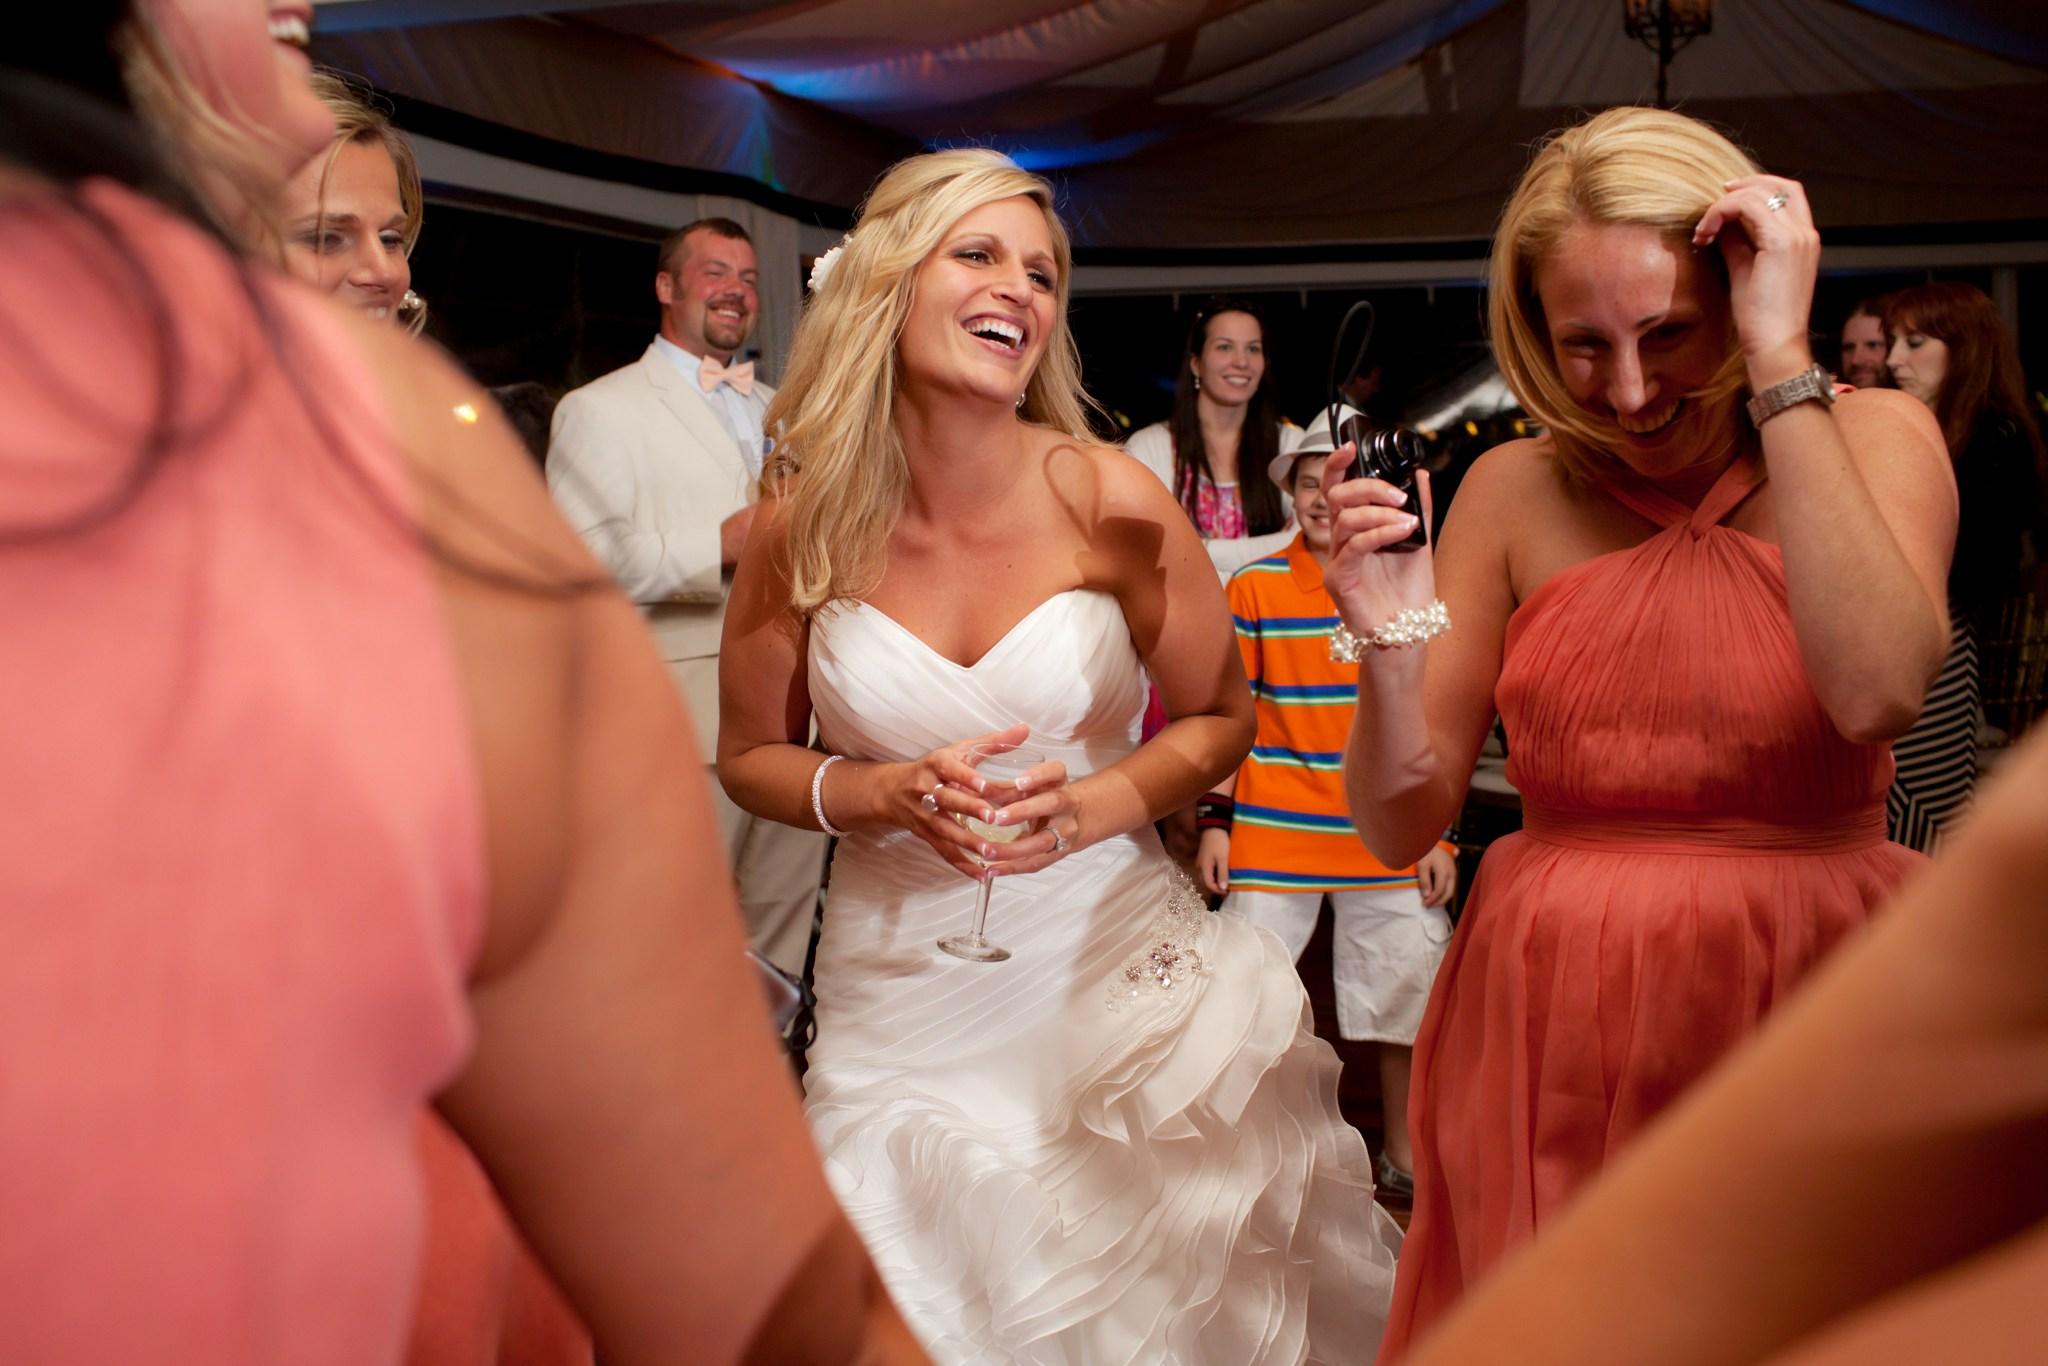 newport_harbor_wedding_00047.JPG